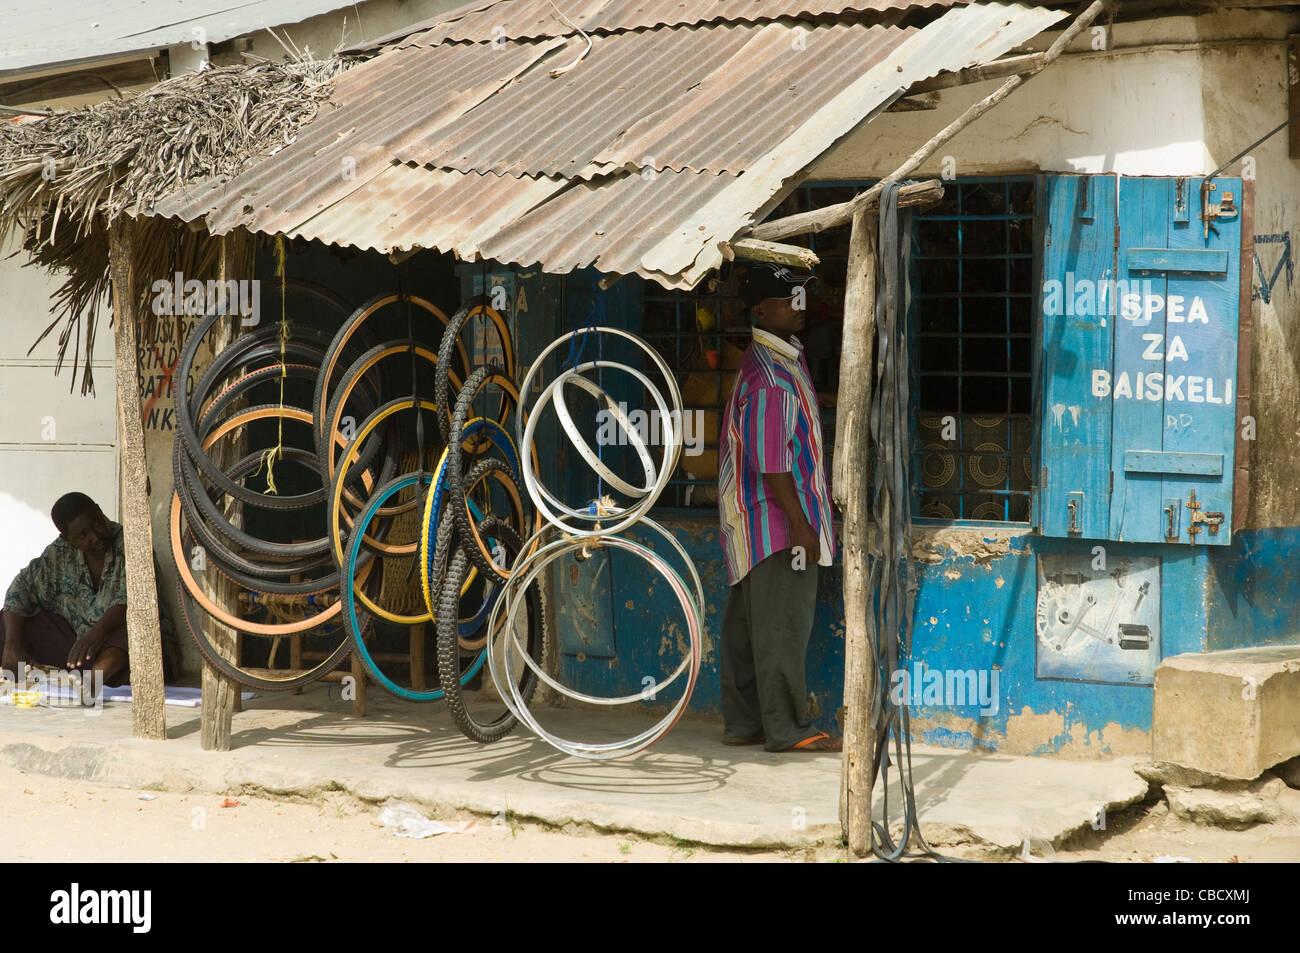 Kiosk with bicycle spare parts Bagamoyo Coastal Region Tanzania - Stock Image